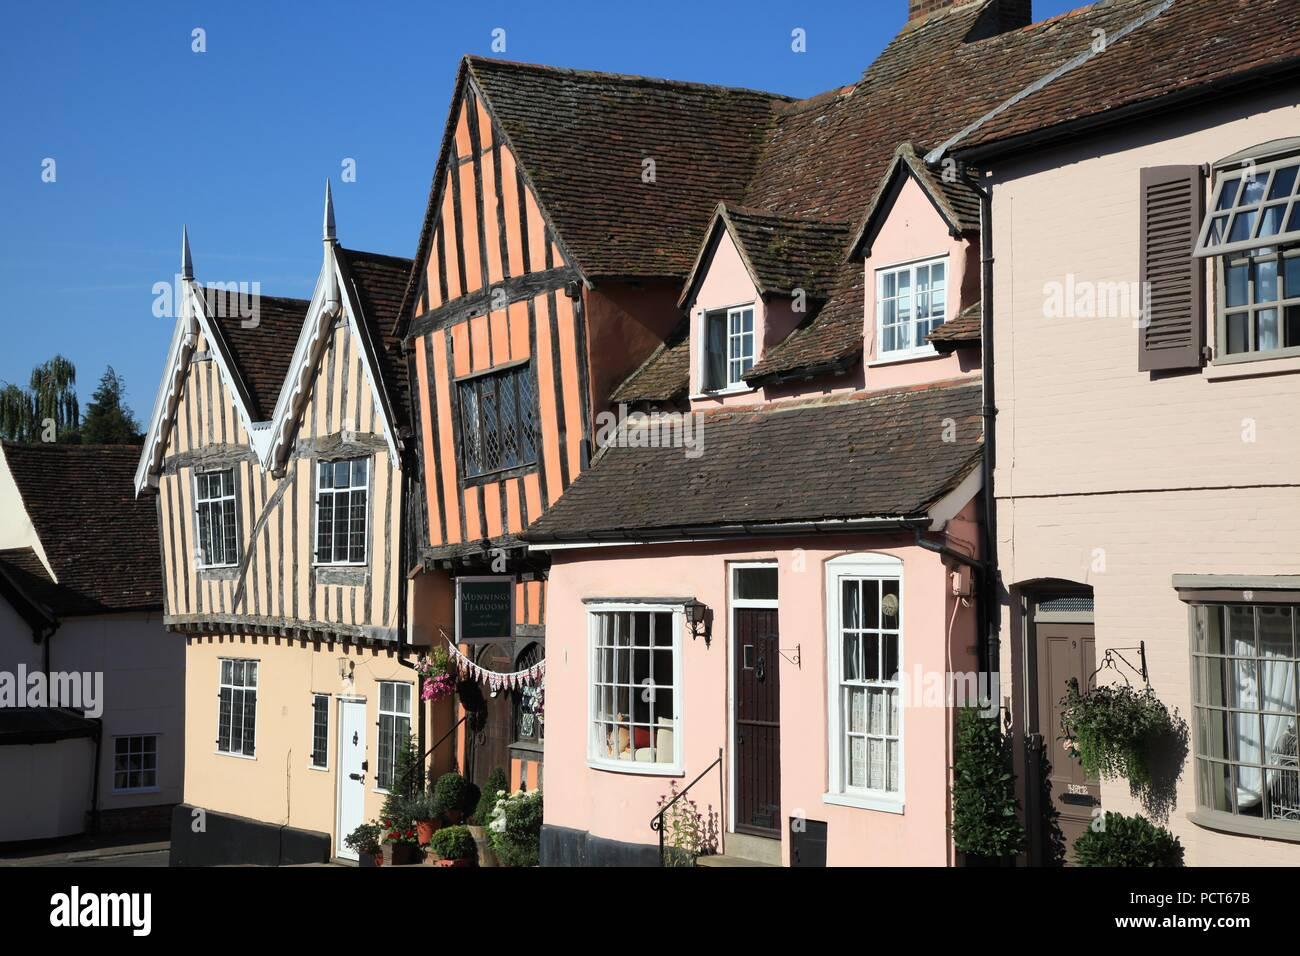 Half timbered Medieval buildings in Lavenham Suffolk UK - Stock Image